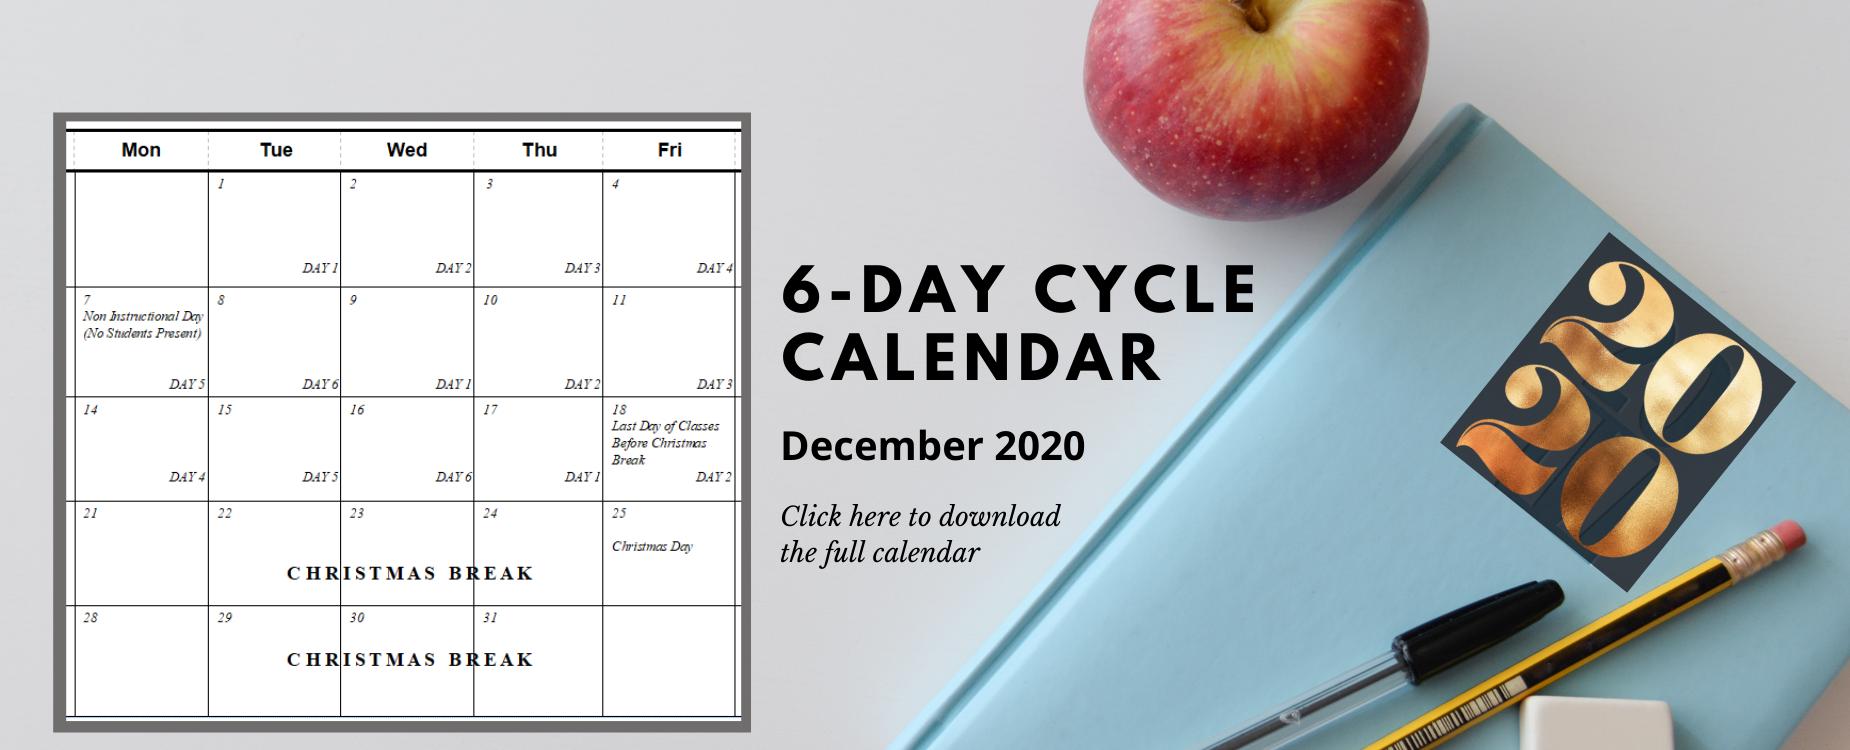 6-Day Cycle Calendar MVSD